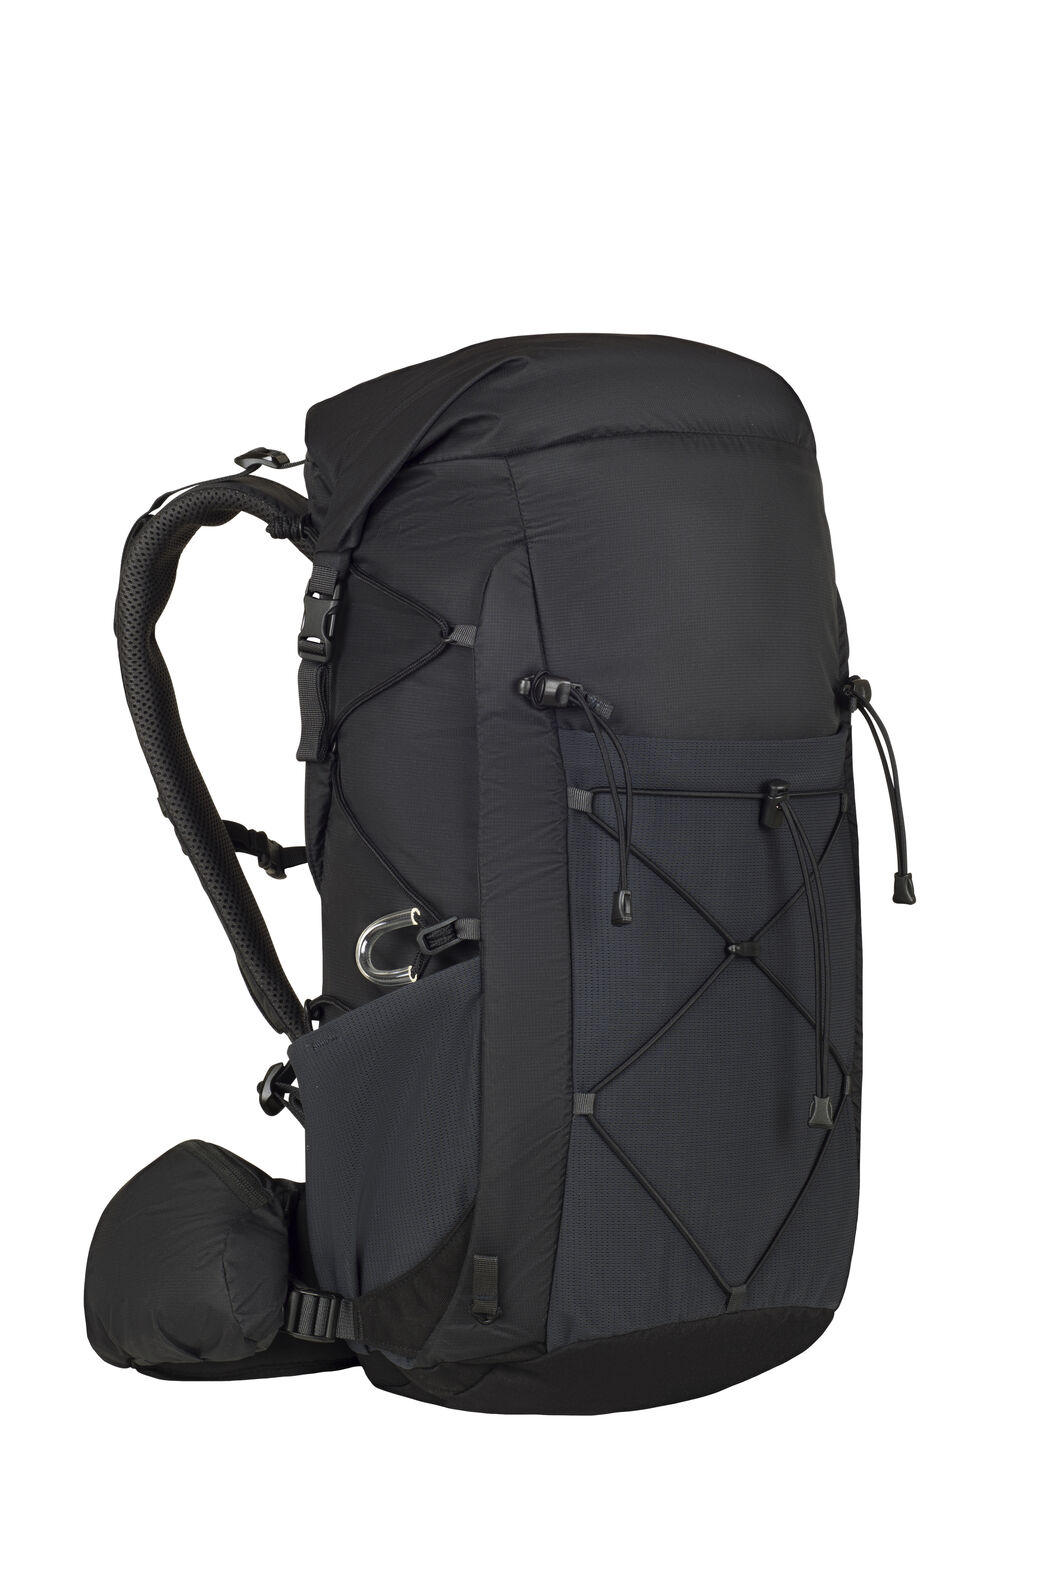 Macpac Fiord 28L Pack, Black/Black, hi-res